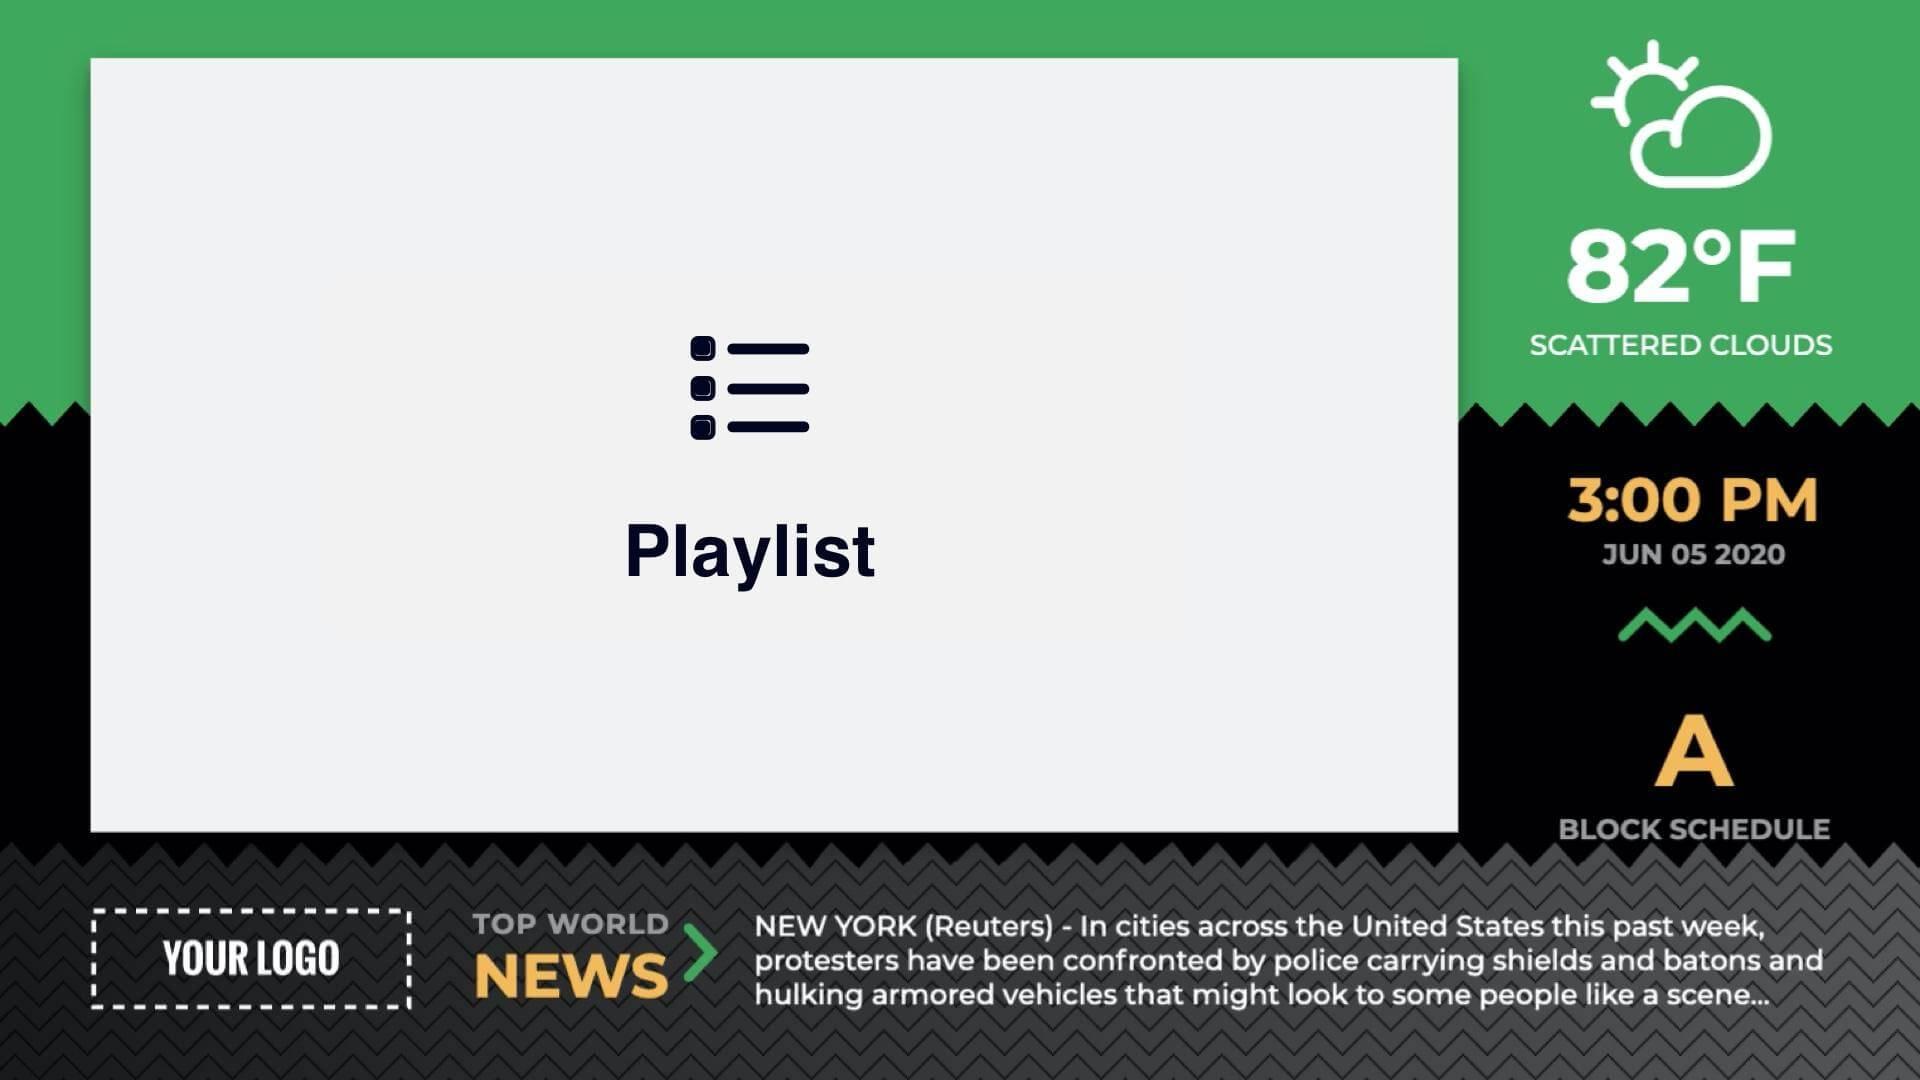 Zoned Sawtooth Playlist Presentation Digital Signage Template